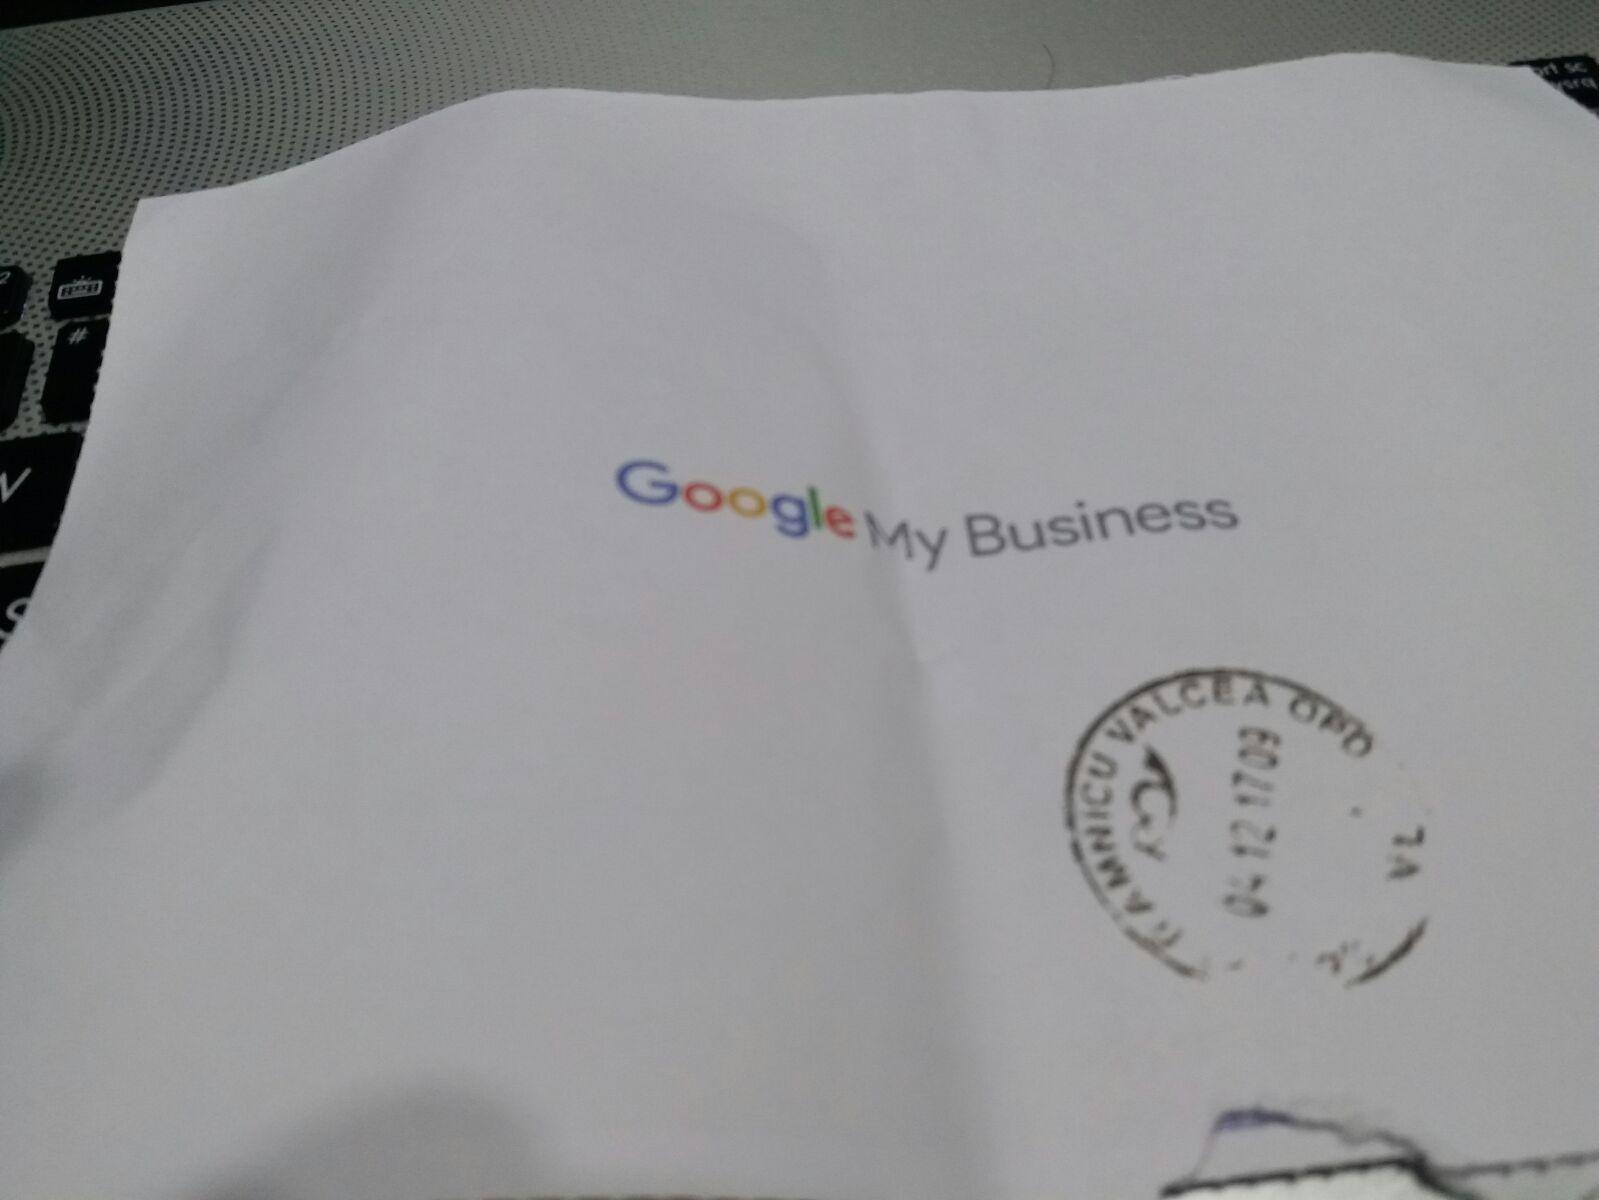 Google My Business confirmation envelope